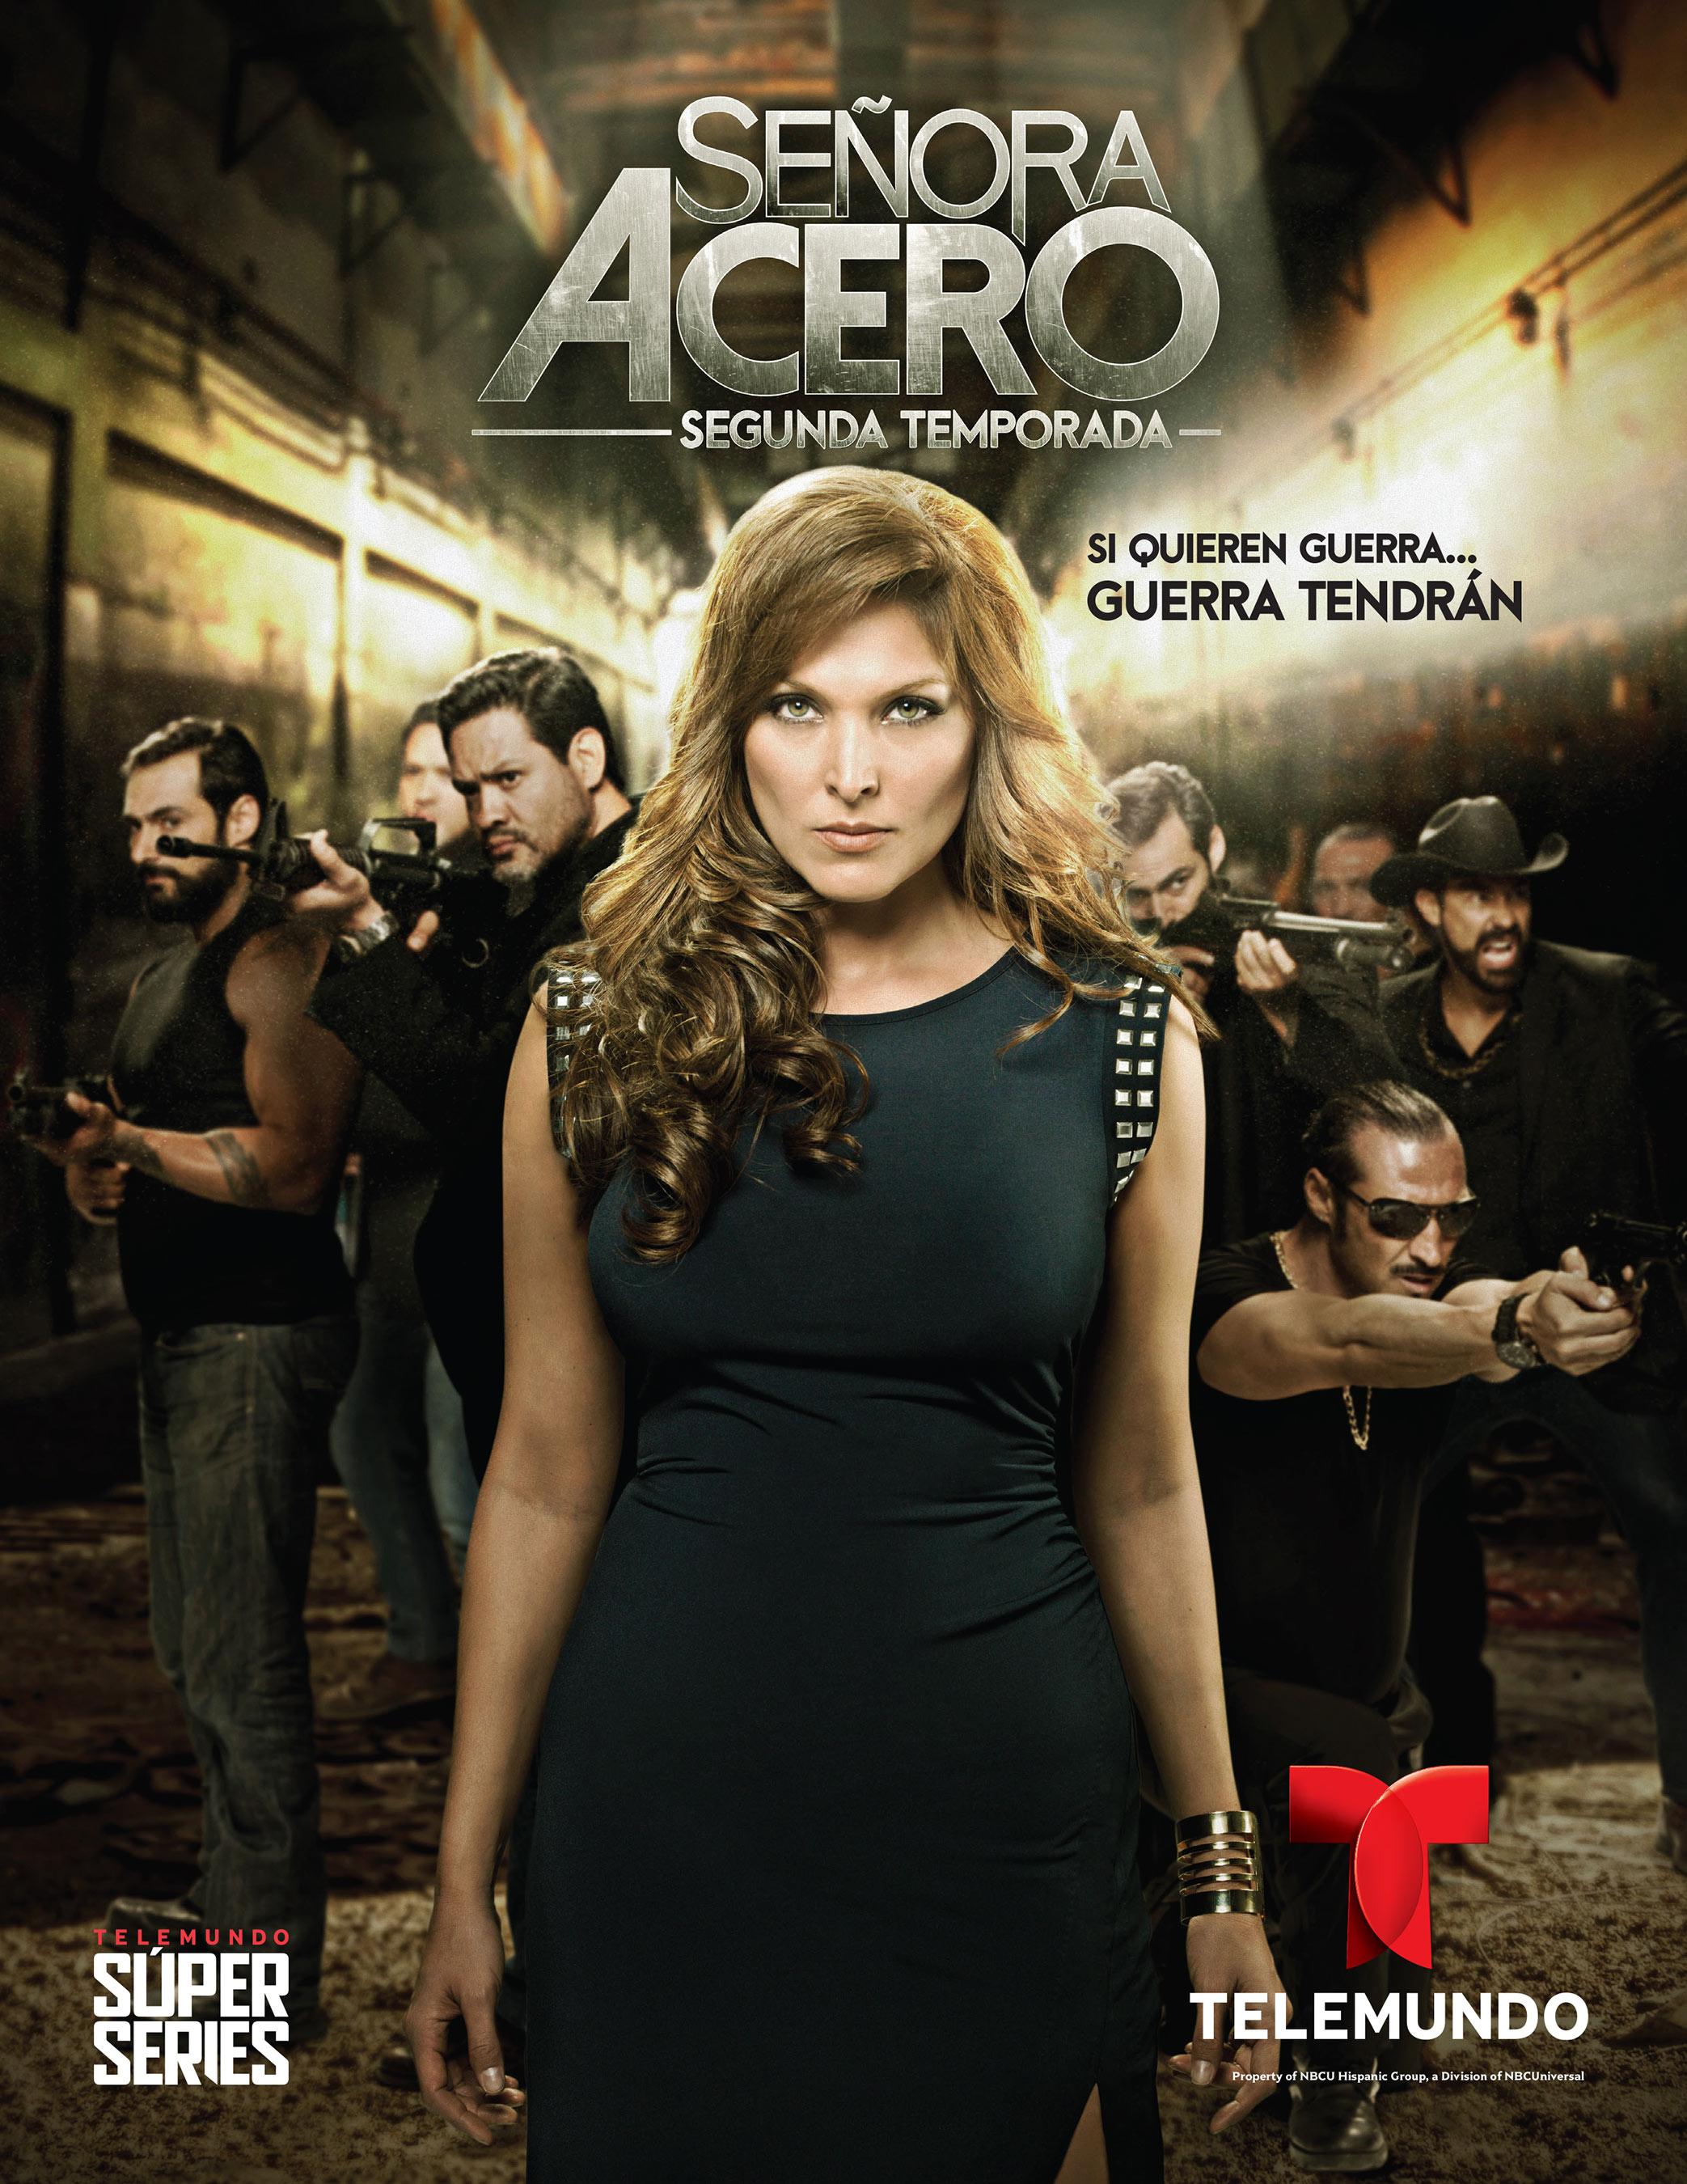 Señora Acero Tv Series 2014 Imdb